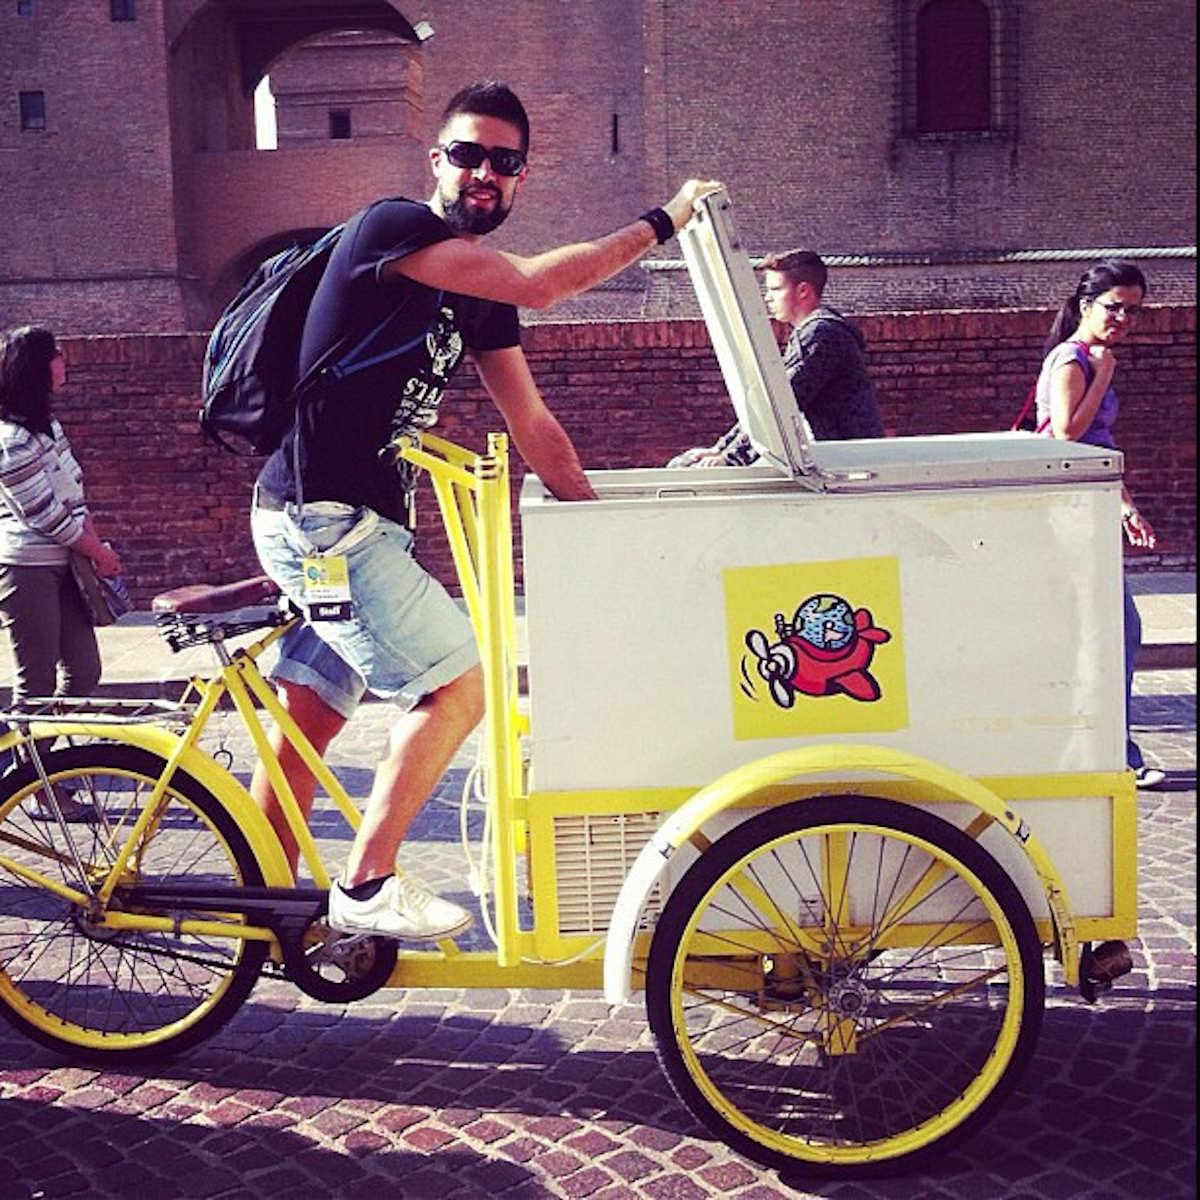 cargo bike a Ferrara (img: Mikael Colville-Andersen